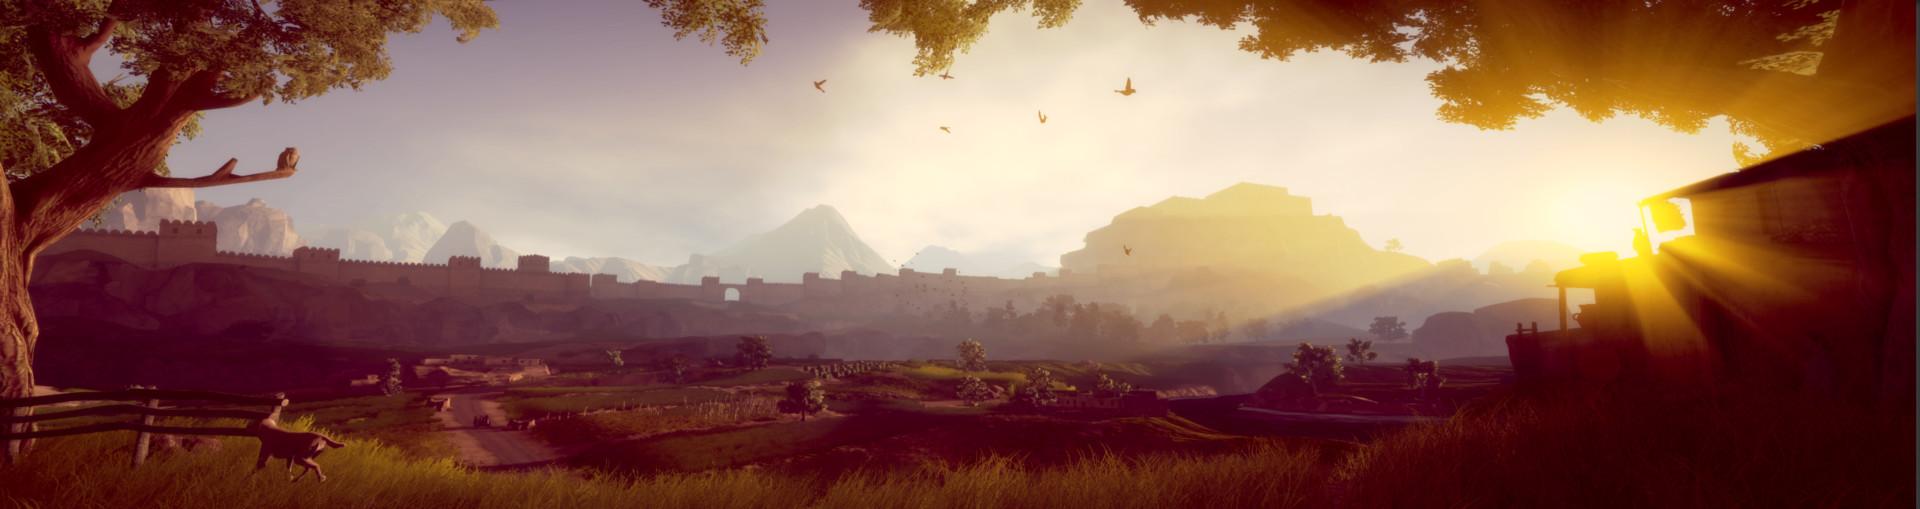 Screenshot from sunrise